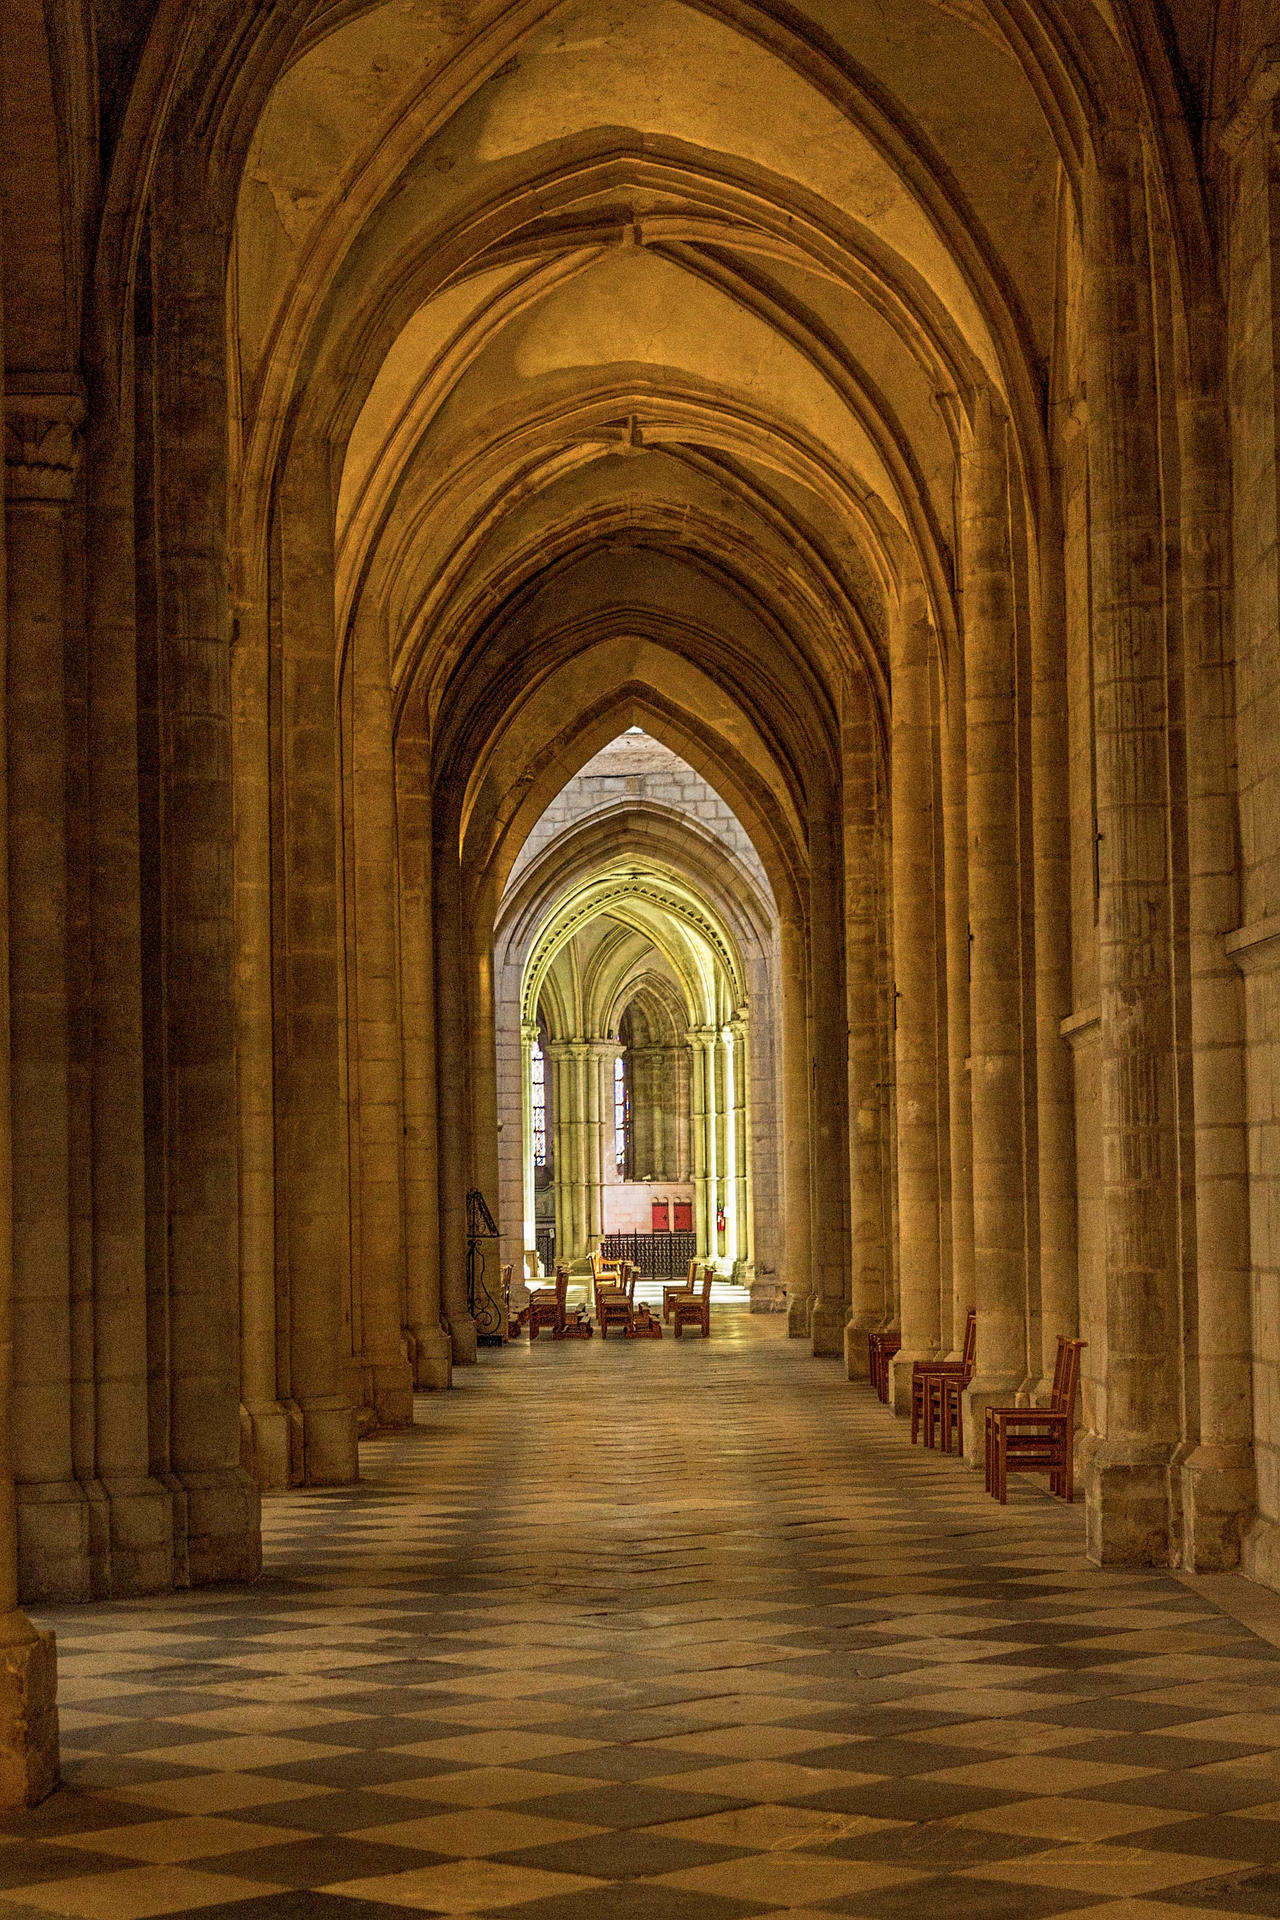 abbaye wallpaper - photo #26